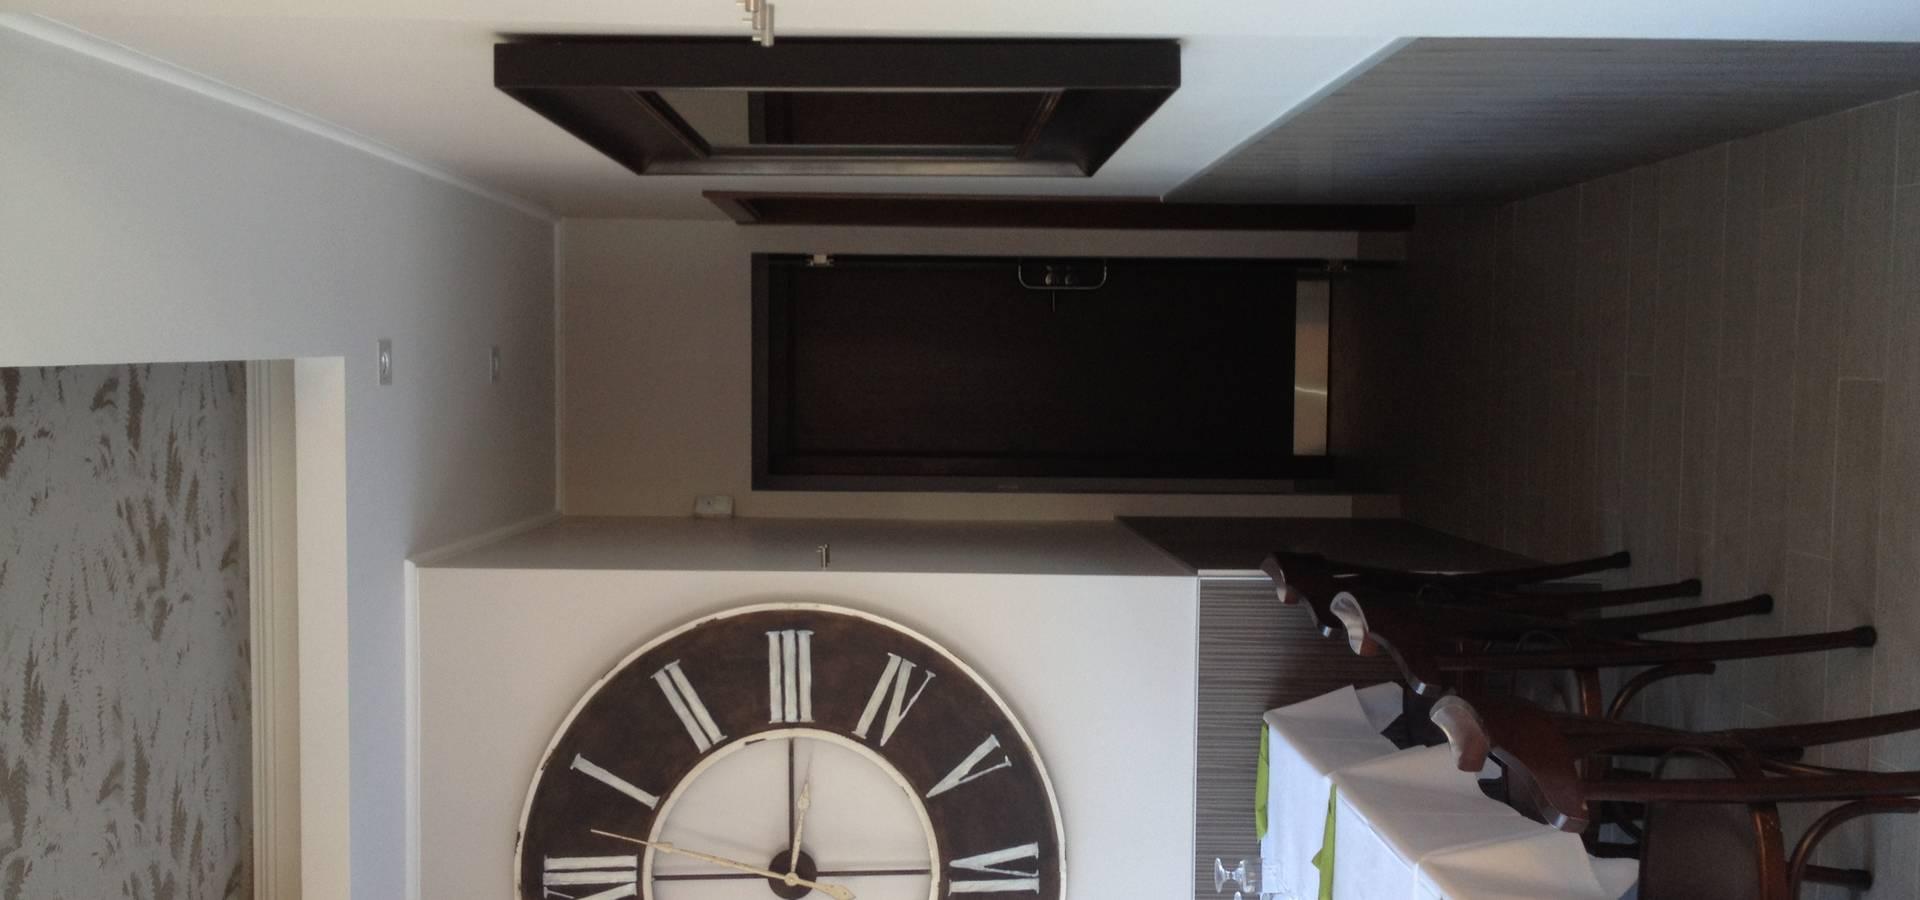 Update – Remodelações de Interiores e Consultoria